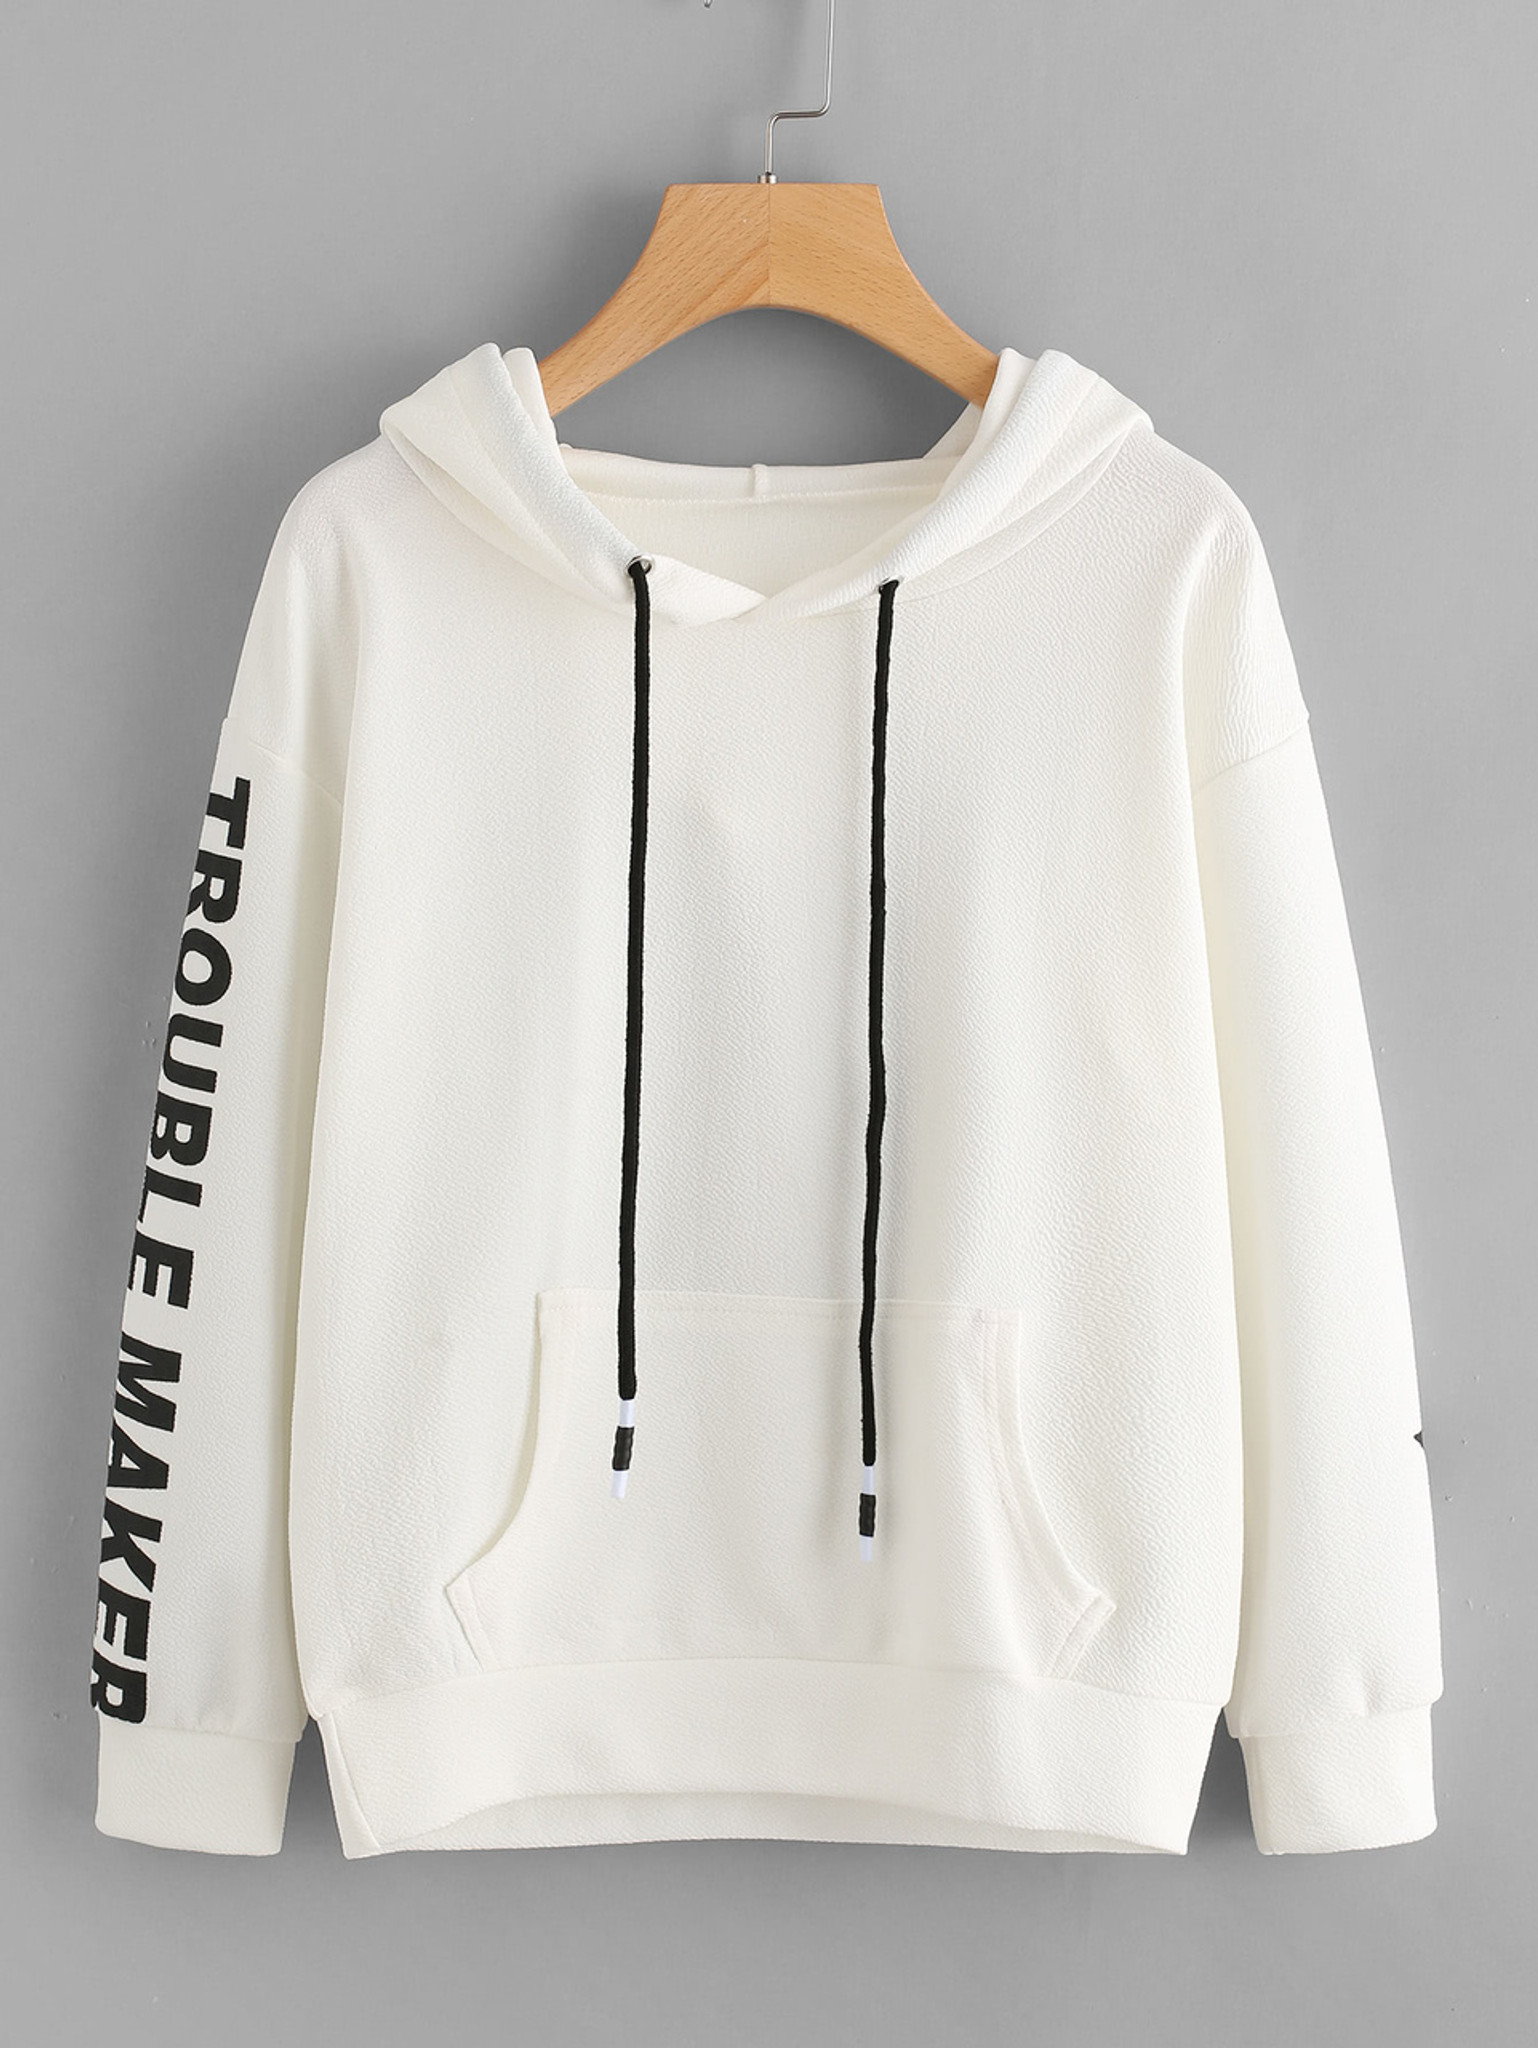 Fifth Avenue Trouble Maker Sleeve Print Hoodie - White